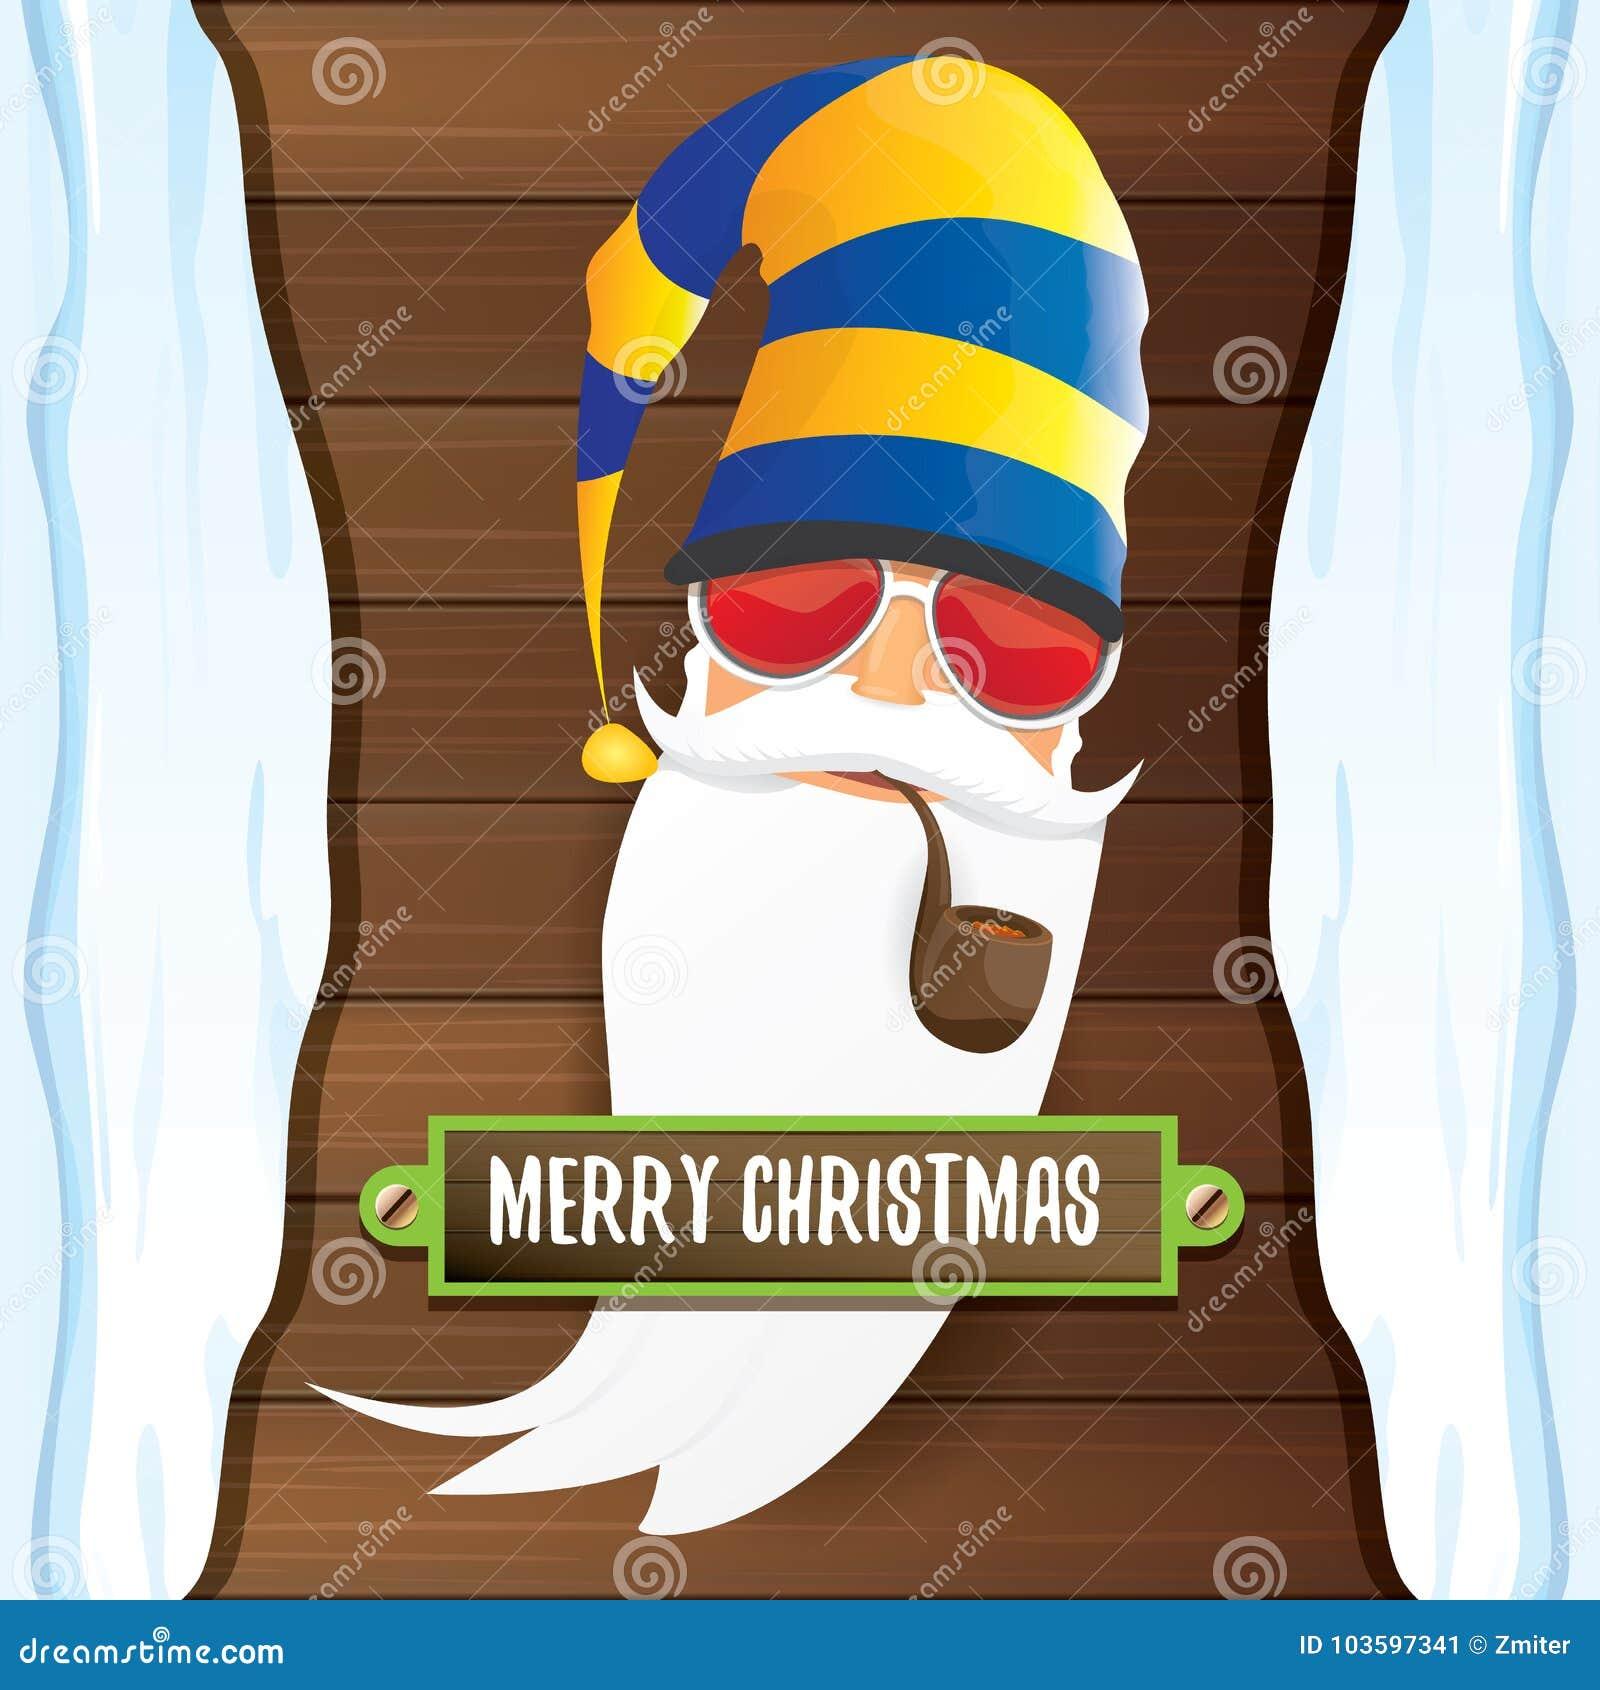 Vector Bad Rock N Roll Dj Santa Claus With Smoking Pipe